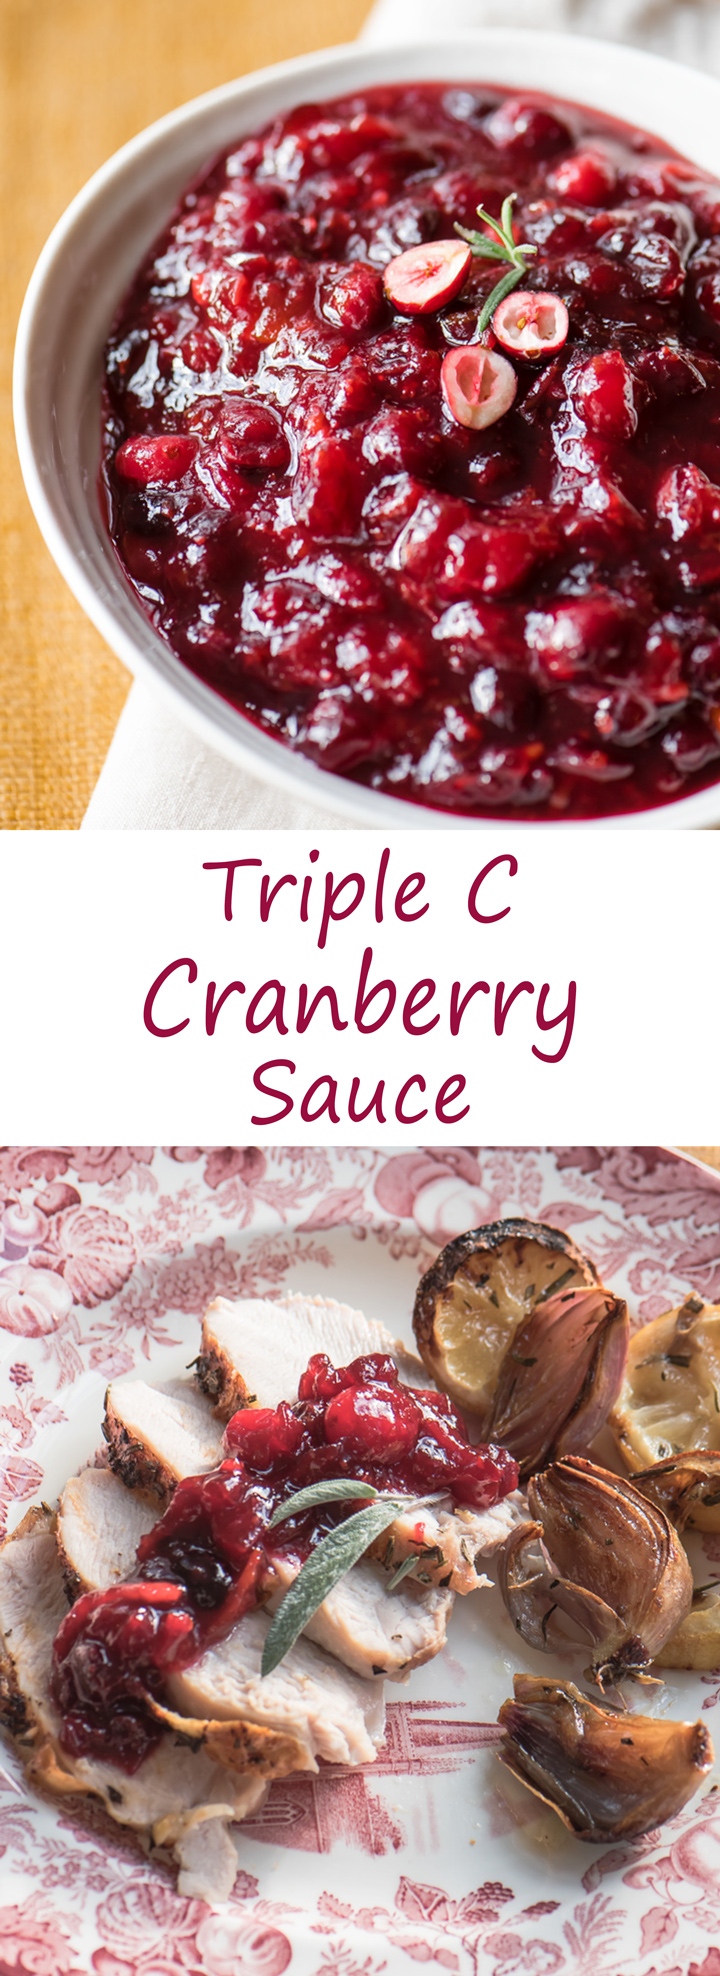 Triple C Cranberry Sauce Recipe has bright cranberry and orange flavor. Delicious and easy recipe.